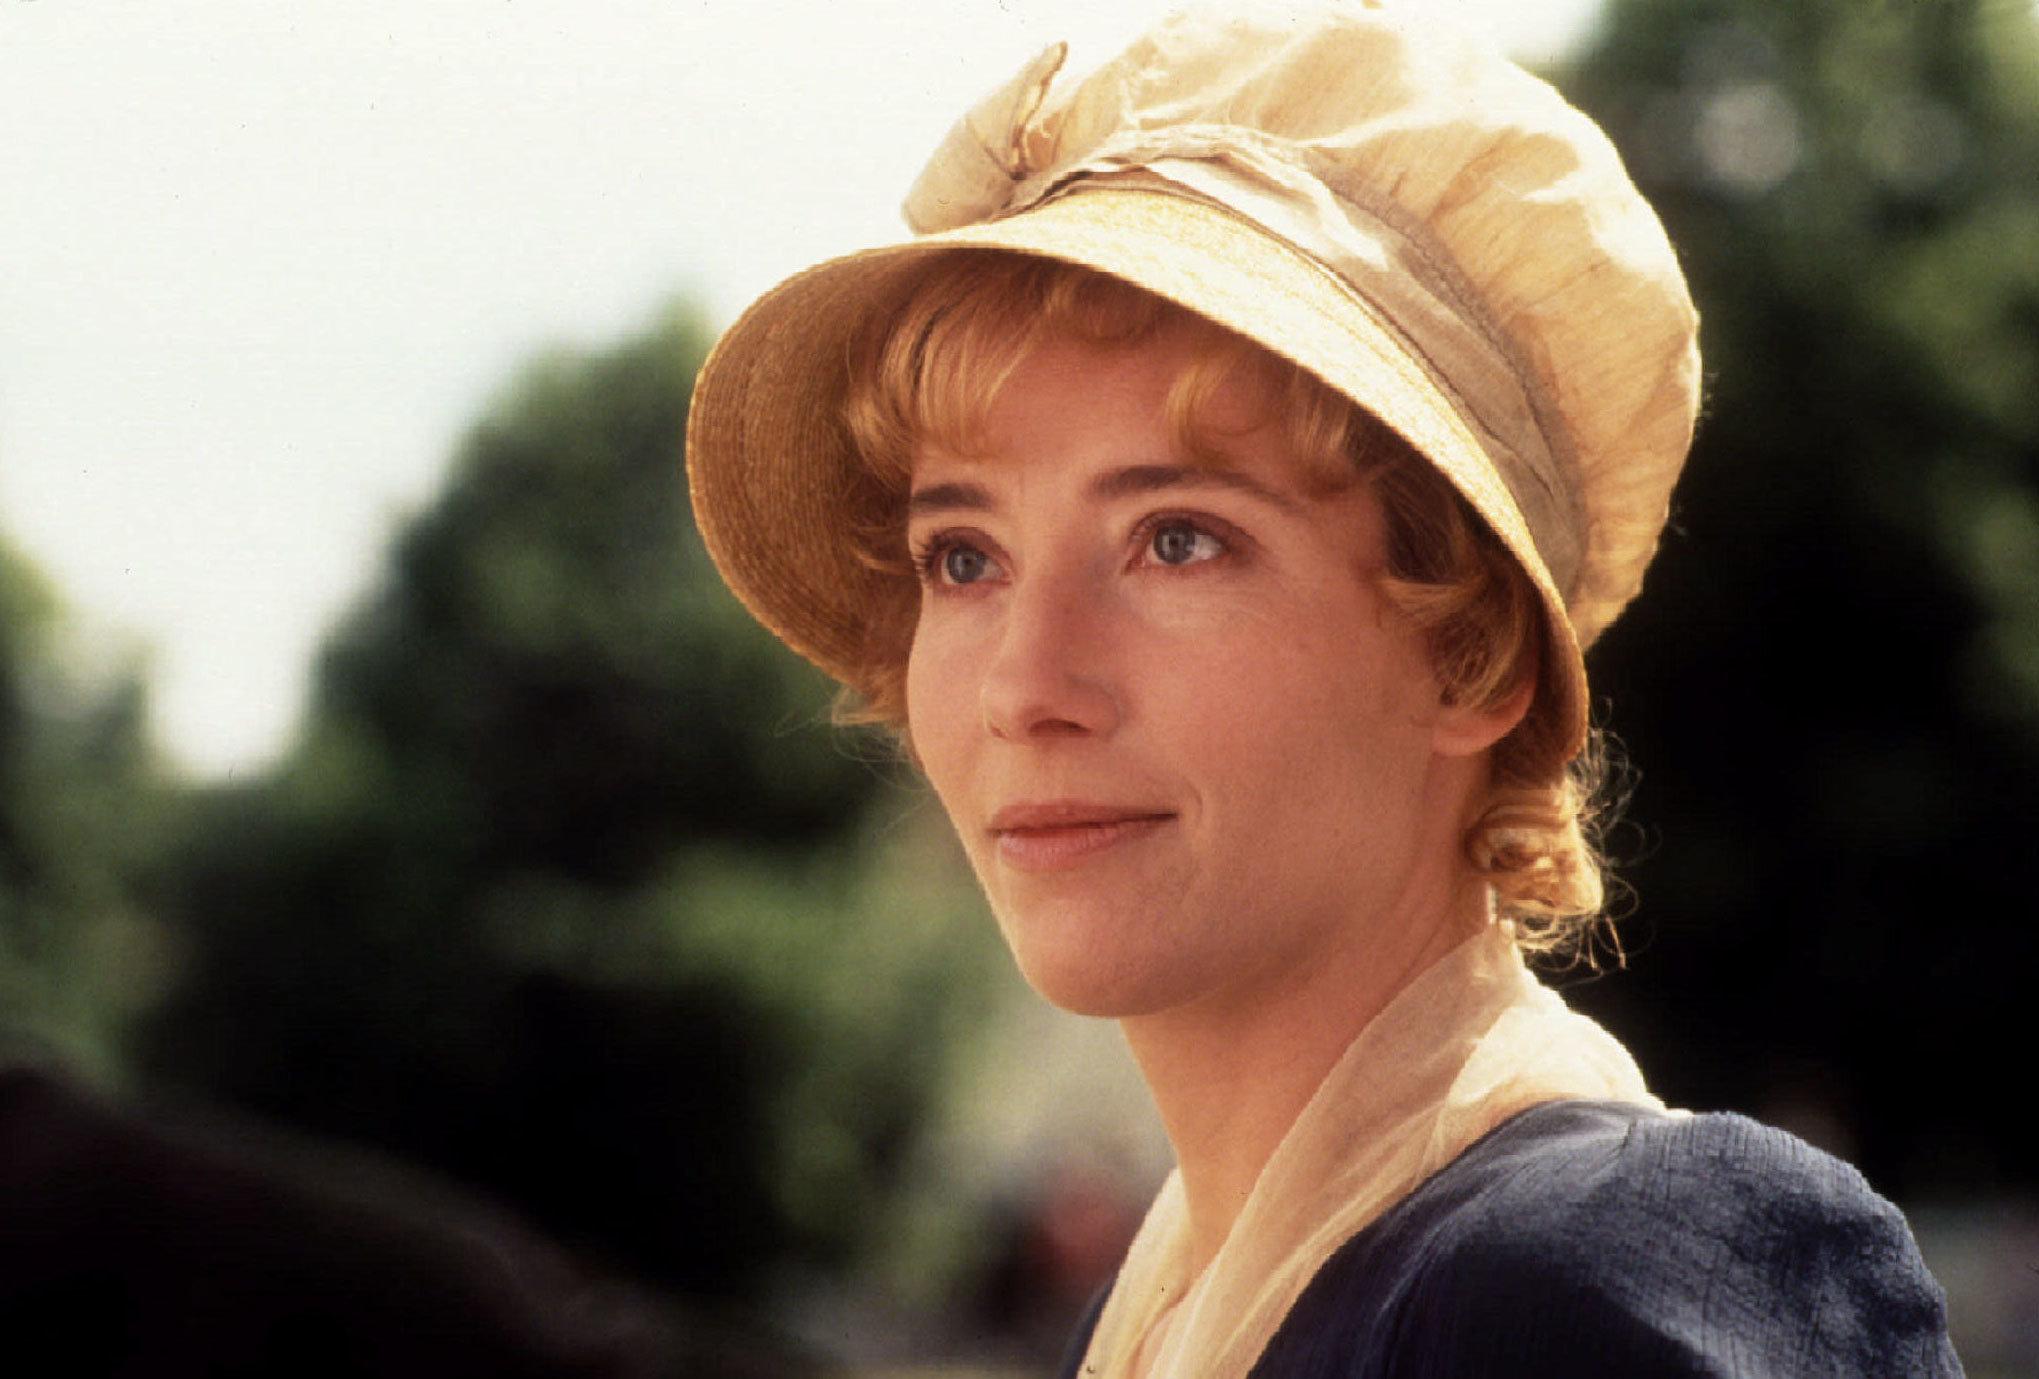 Emma Thompson as seen in